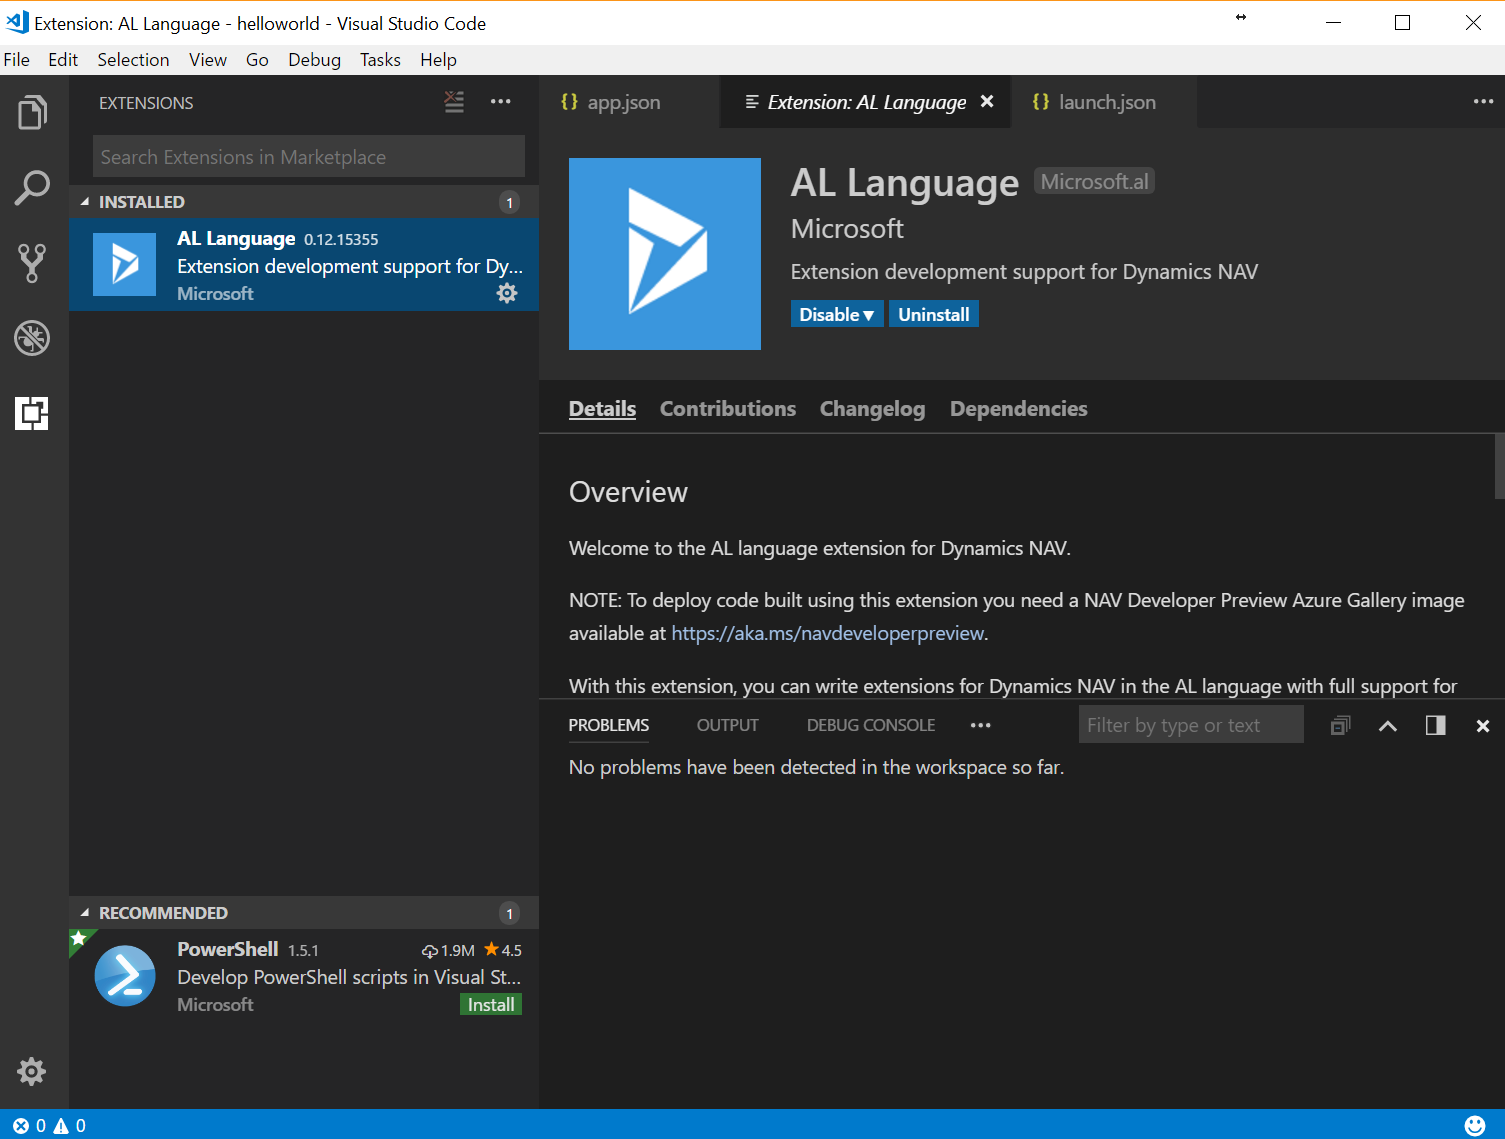 Configuración de Visual Studio Code con Dynamics NAV 2018